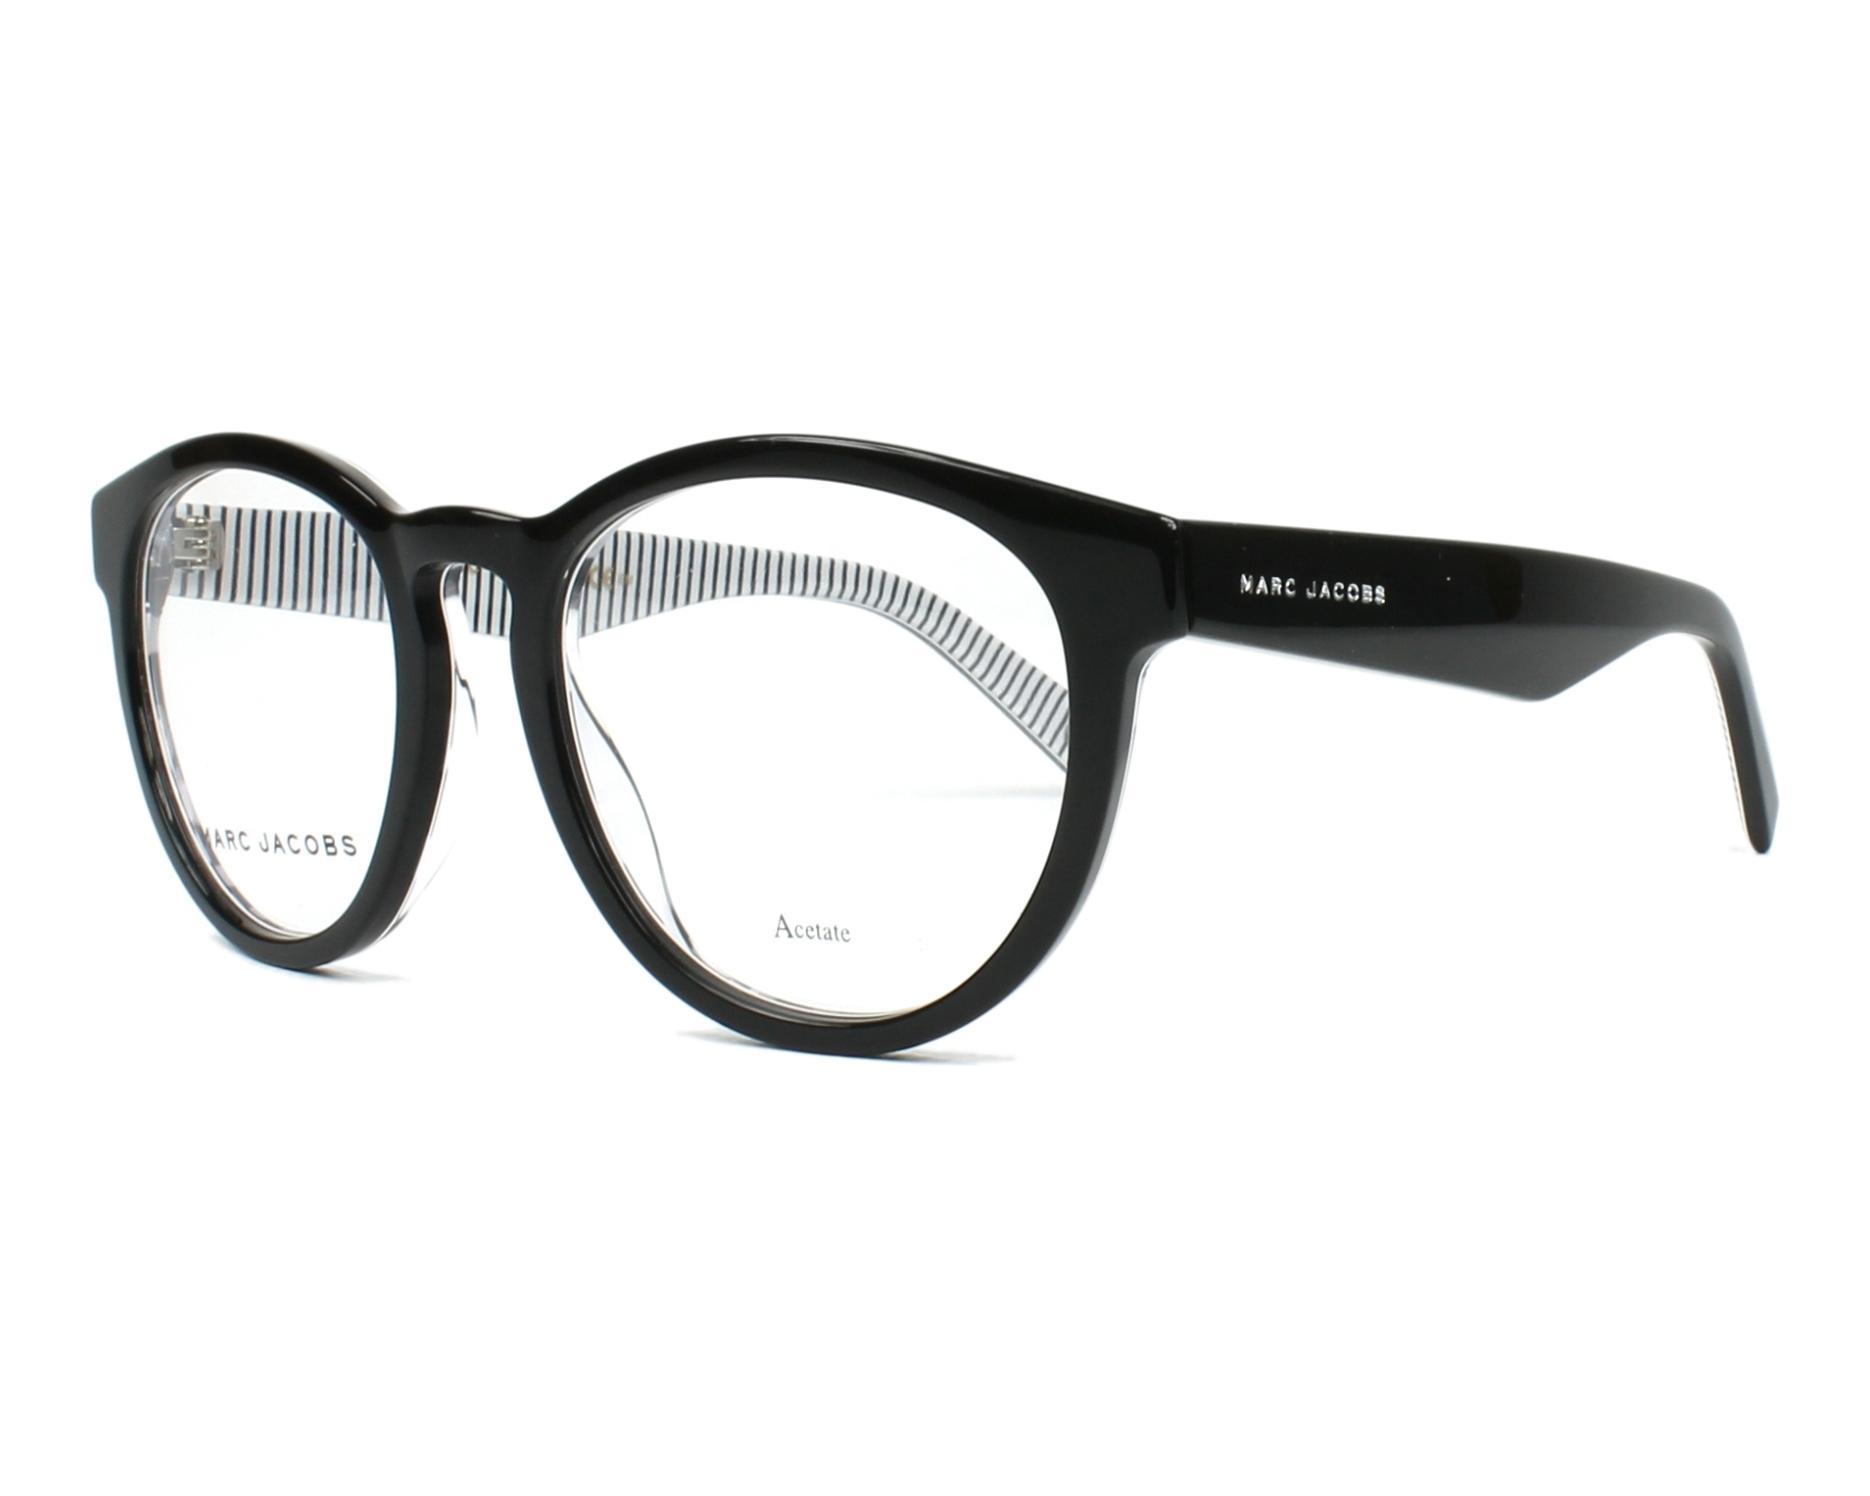 14879b34cad5 eyeglasses Marc Jacobs MARC-237 M4P - Black Zebra profile view